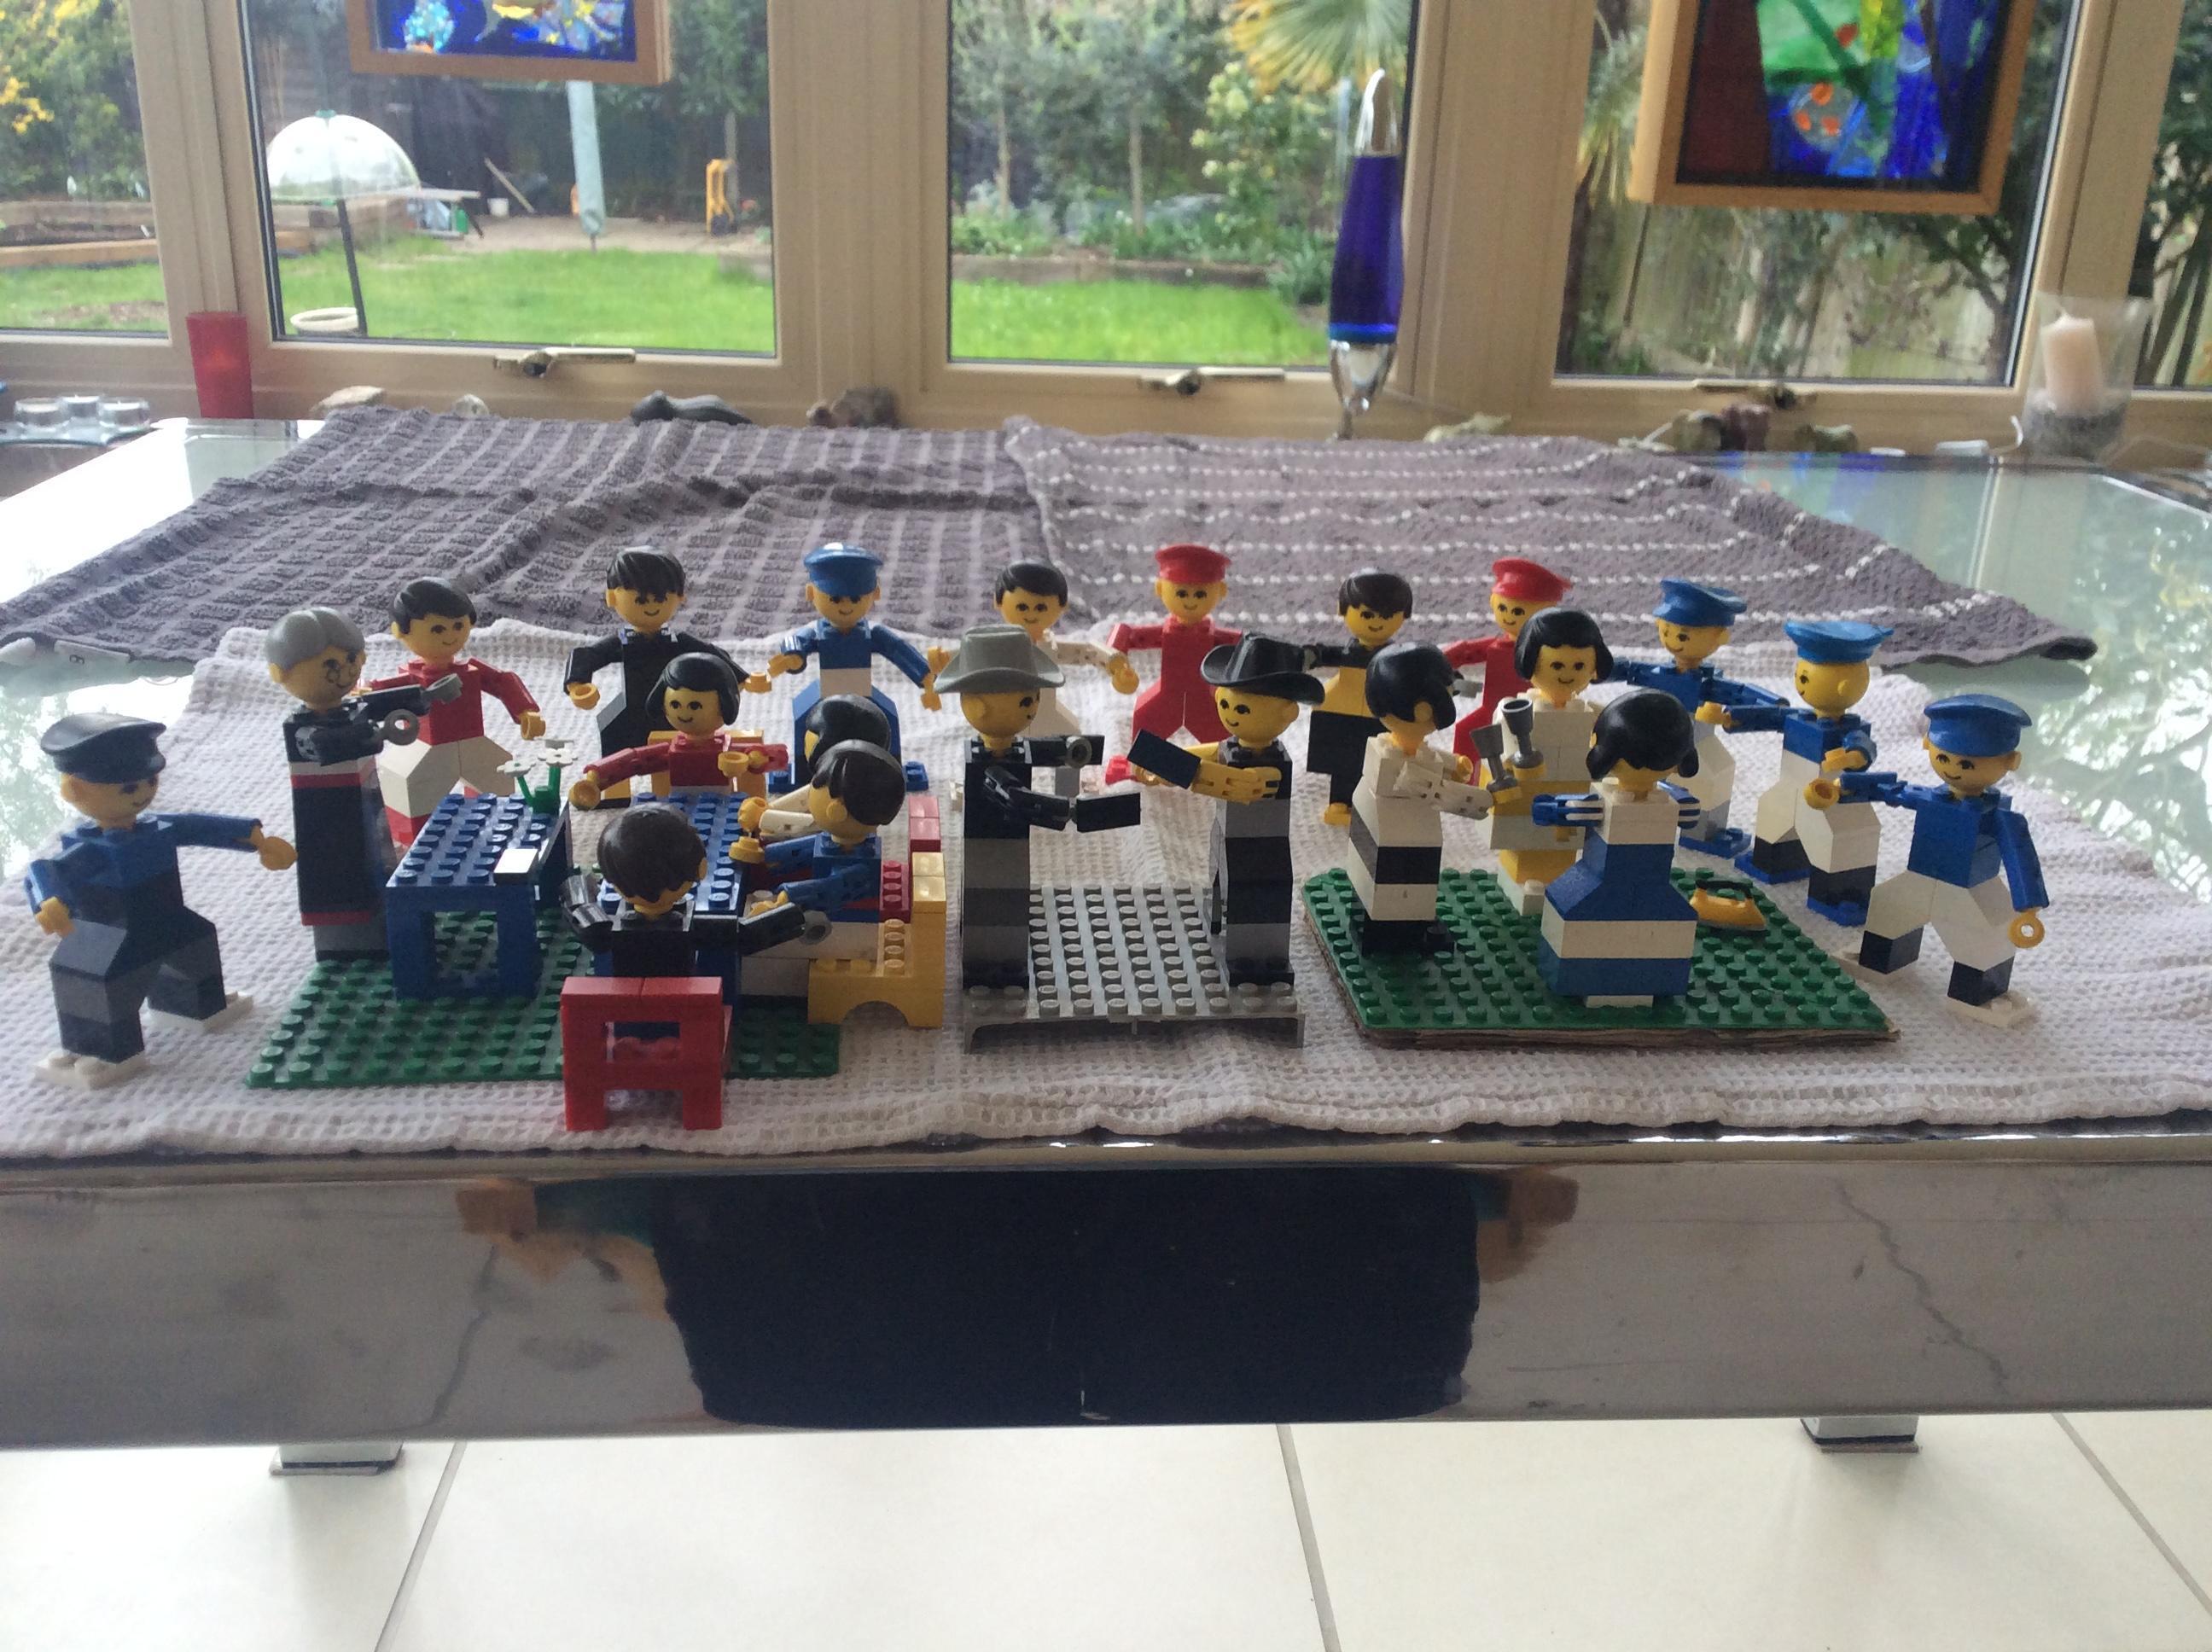 Lego set  (part set) School Room + figures